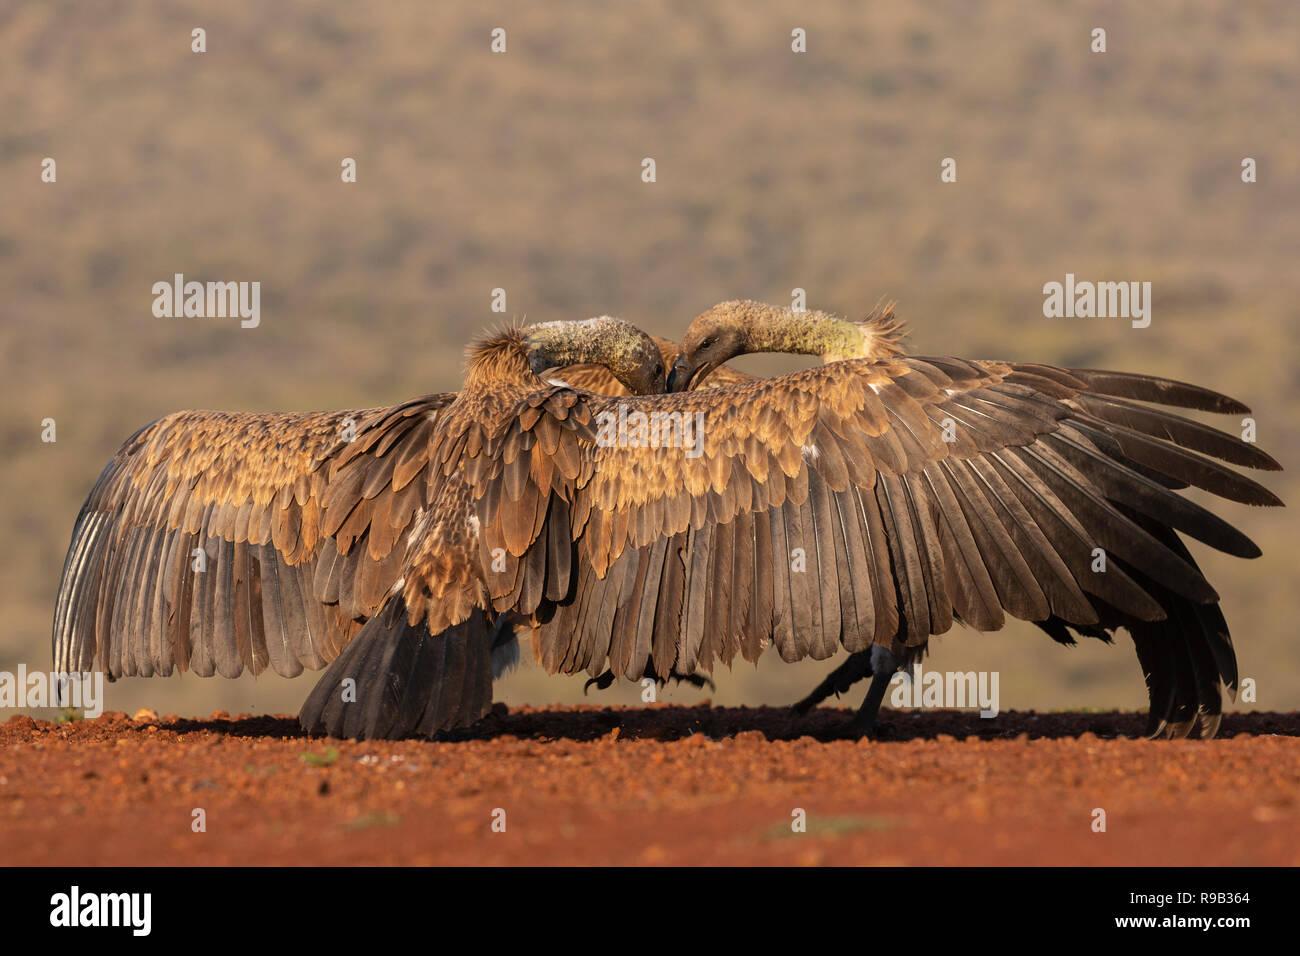 Whitebacked buitres (Gyps africanus) en el enfrentamiento, Zimanga Private Game Reserve, KwaZulu-Natal, Sudáfrica Imagen De Stock